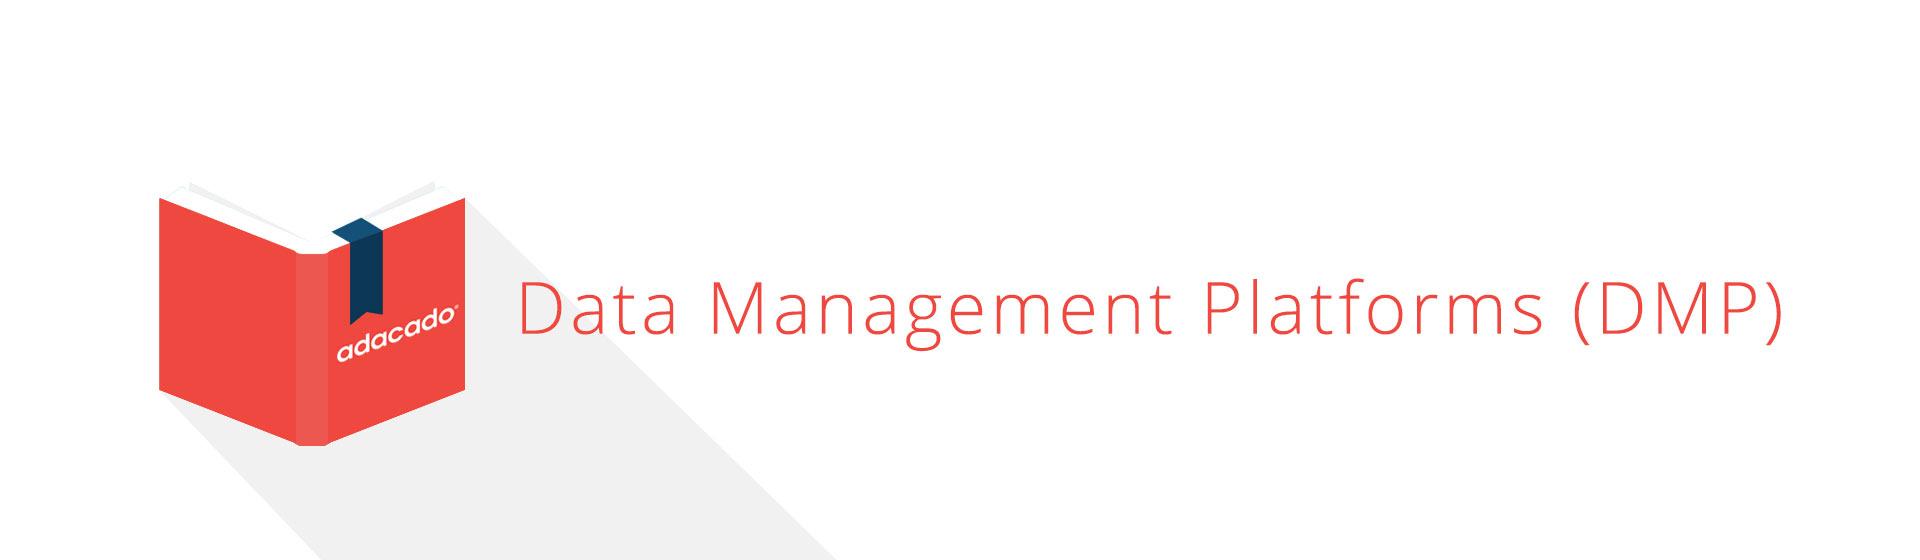 data management platforms